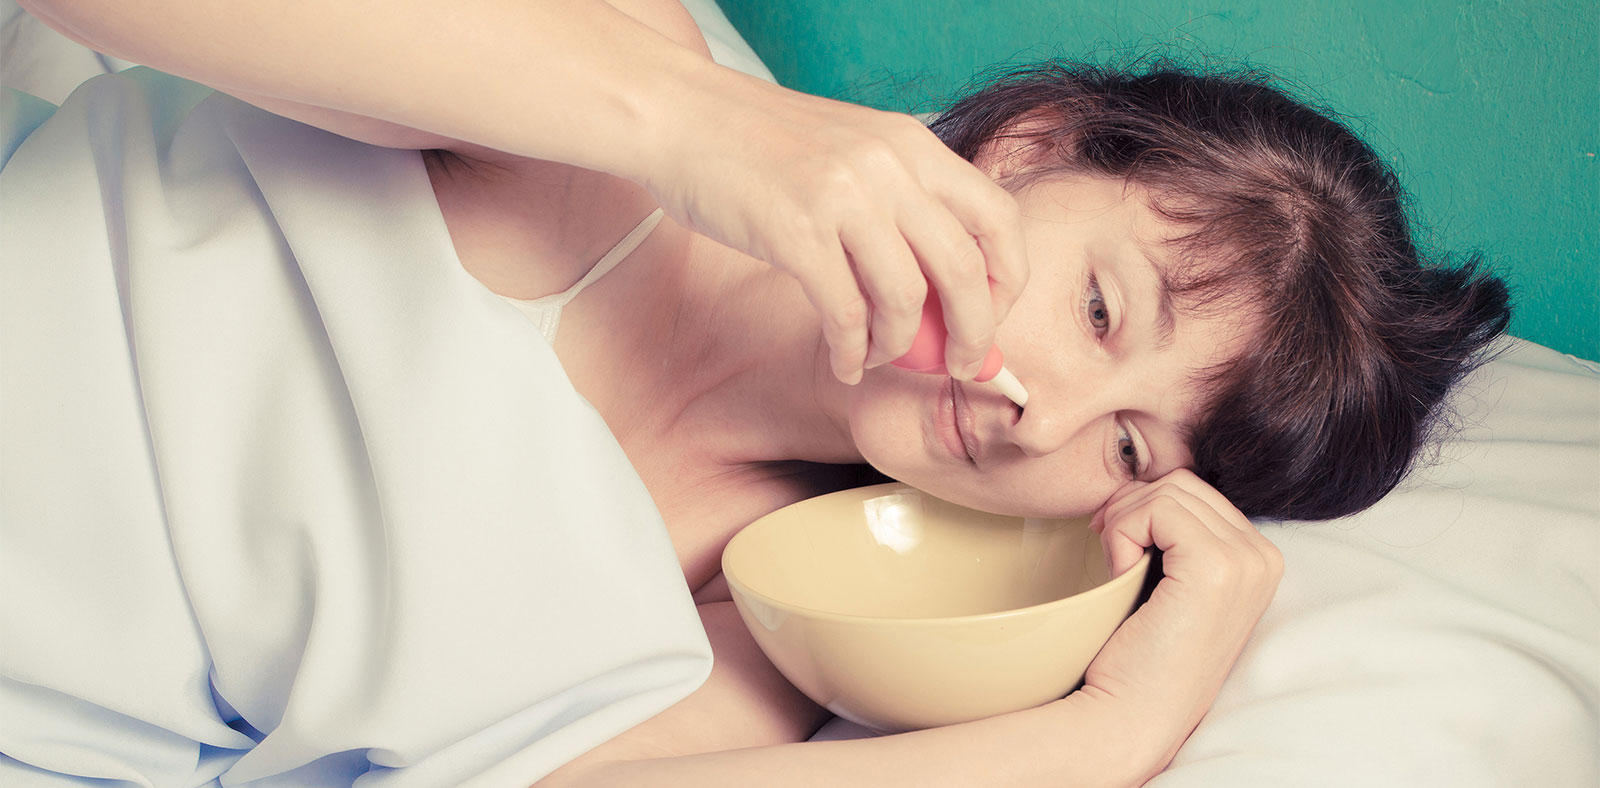 Chronic post nasal drip